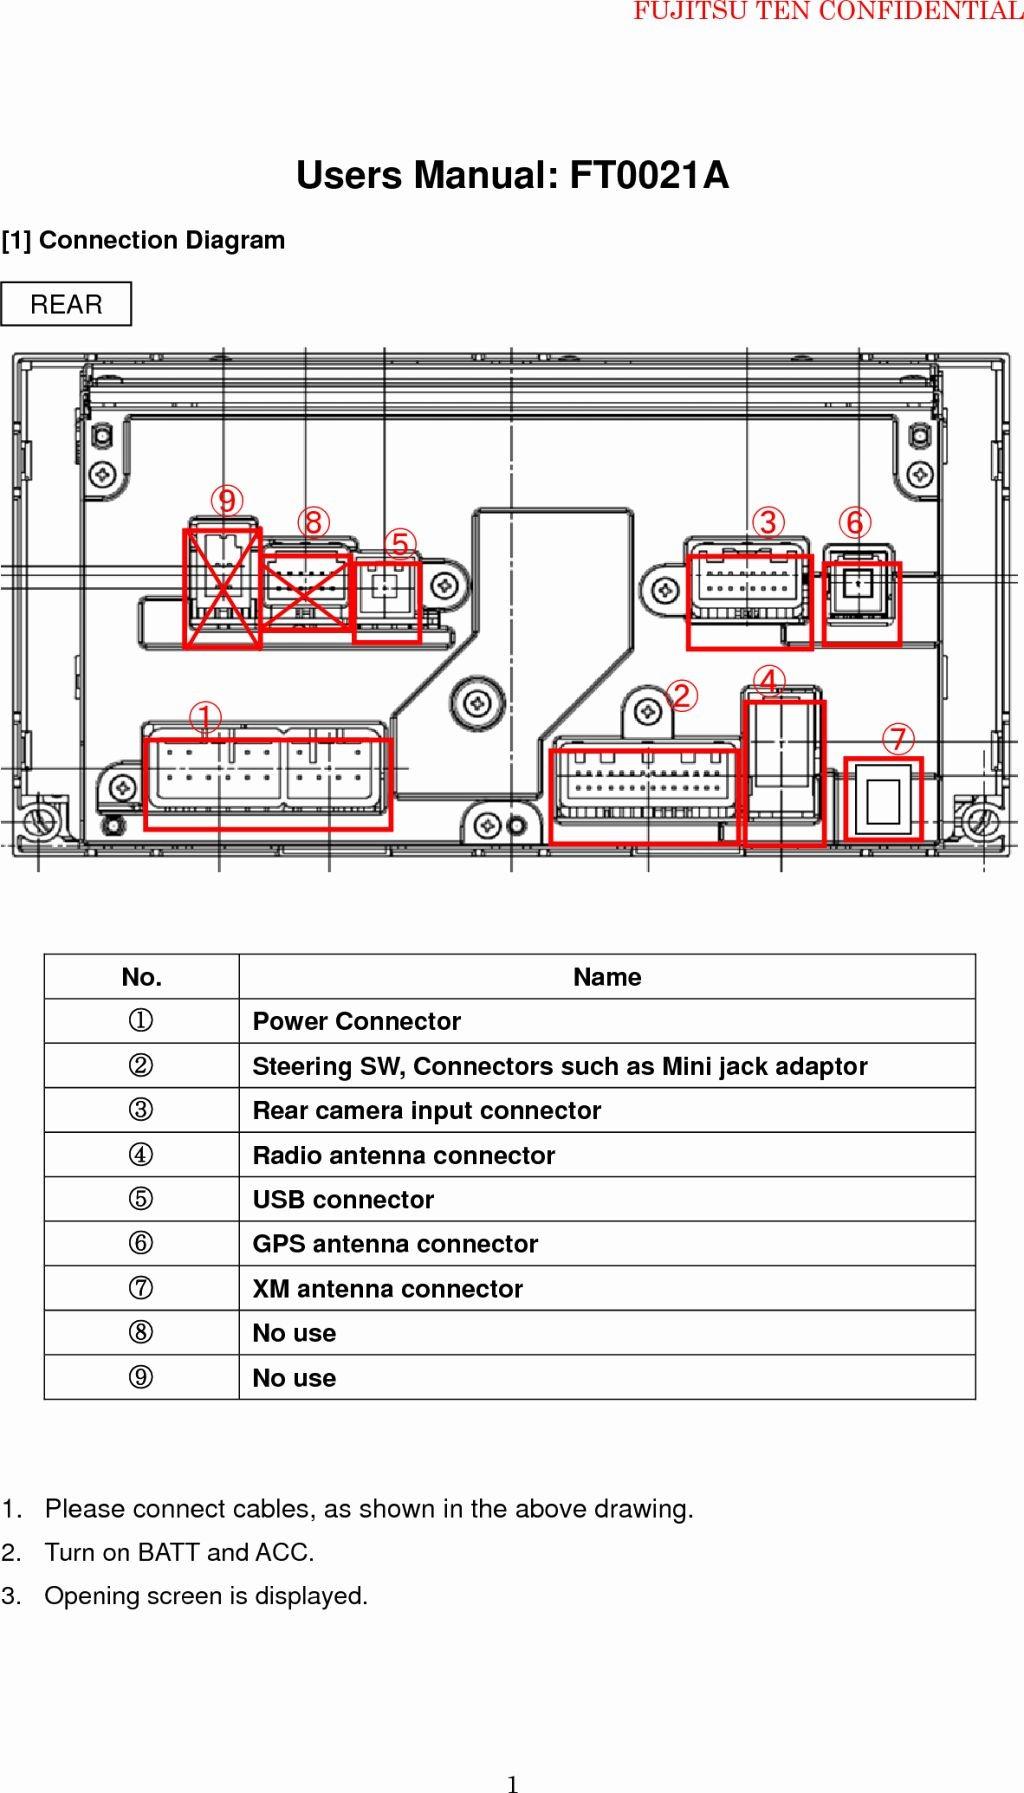 Fujitsu Ten Toyota Wiring Diagram Wiring Diagrams Second Toyota Fujitsu Ten Wiring Diagram Fujitsu Ten Wiring Diagram Source fujitsu ten car radio